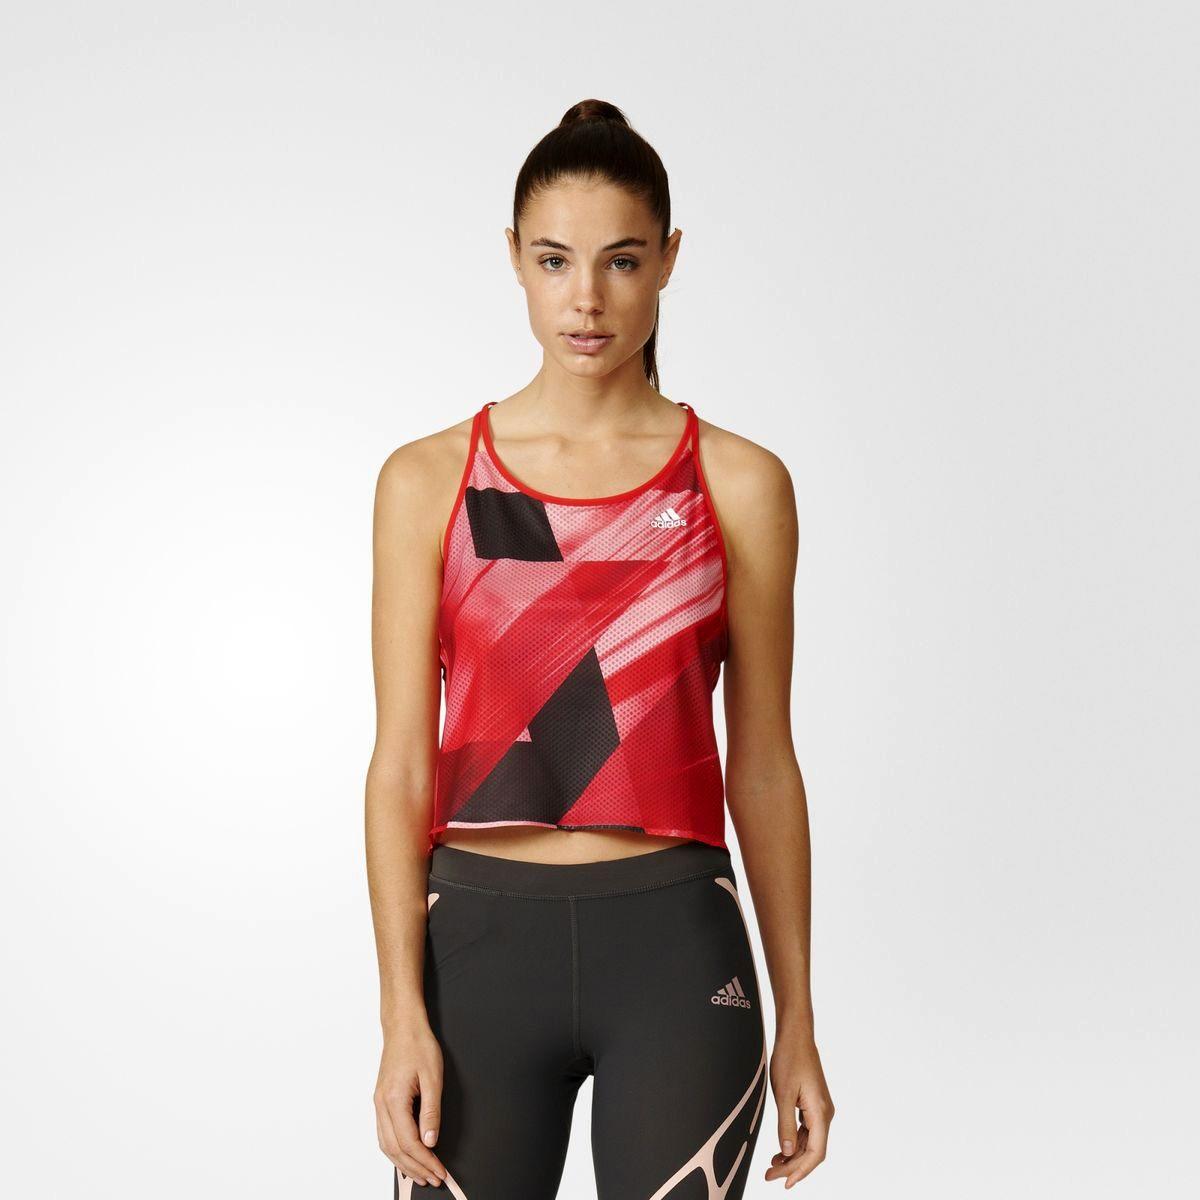 b2223bd0 Type Shirts adidas WMNS adizero Singlet